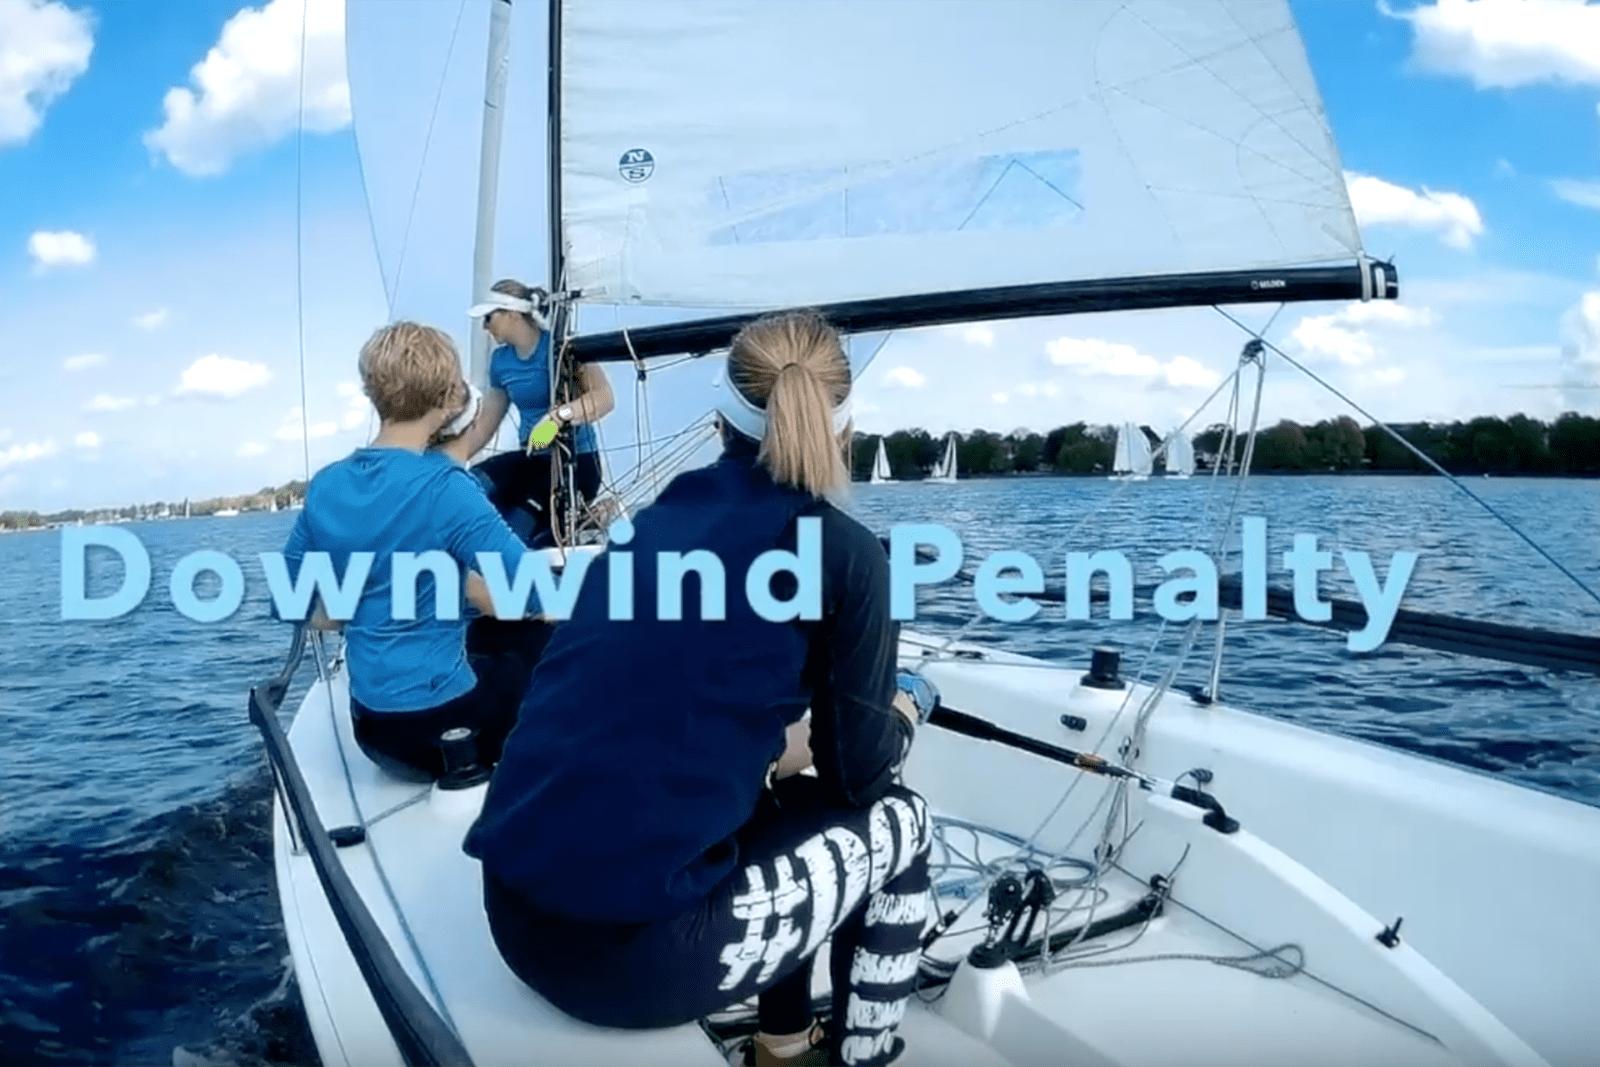 Video-Tutorial: downwind penalty